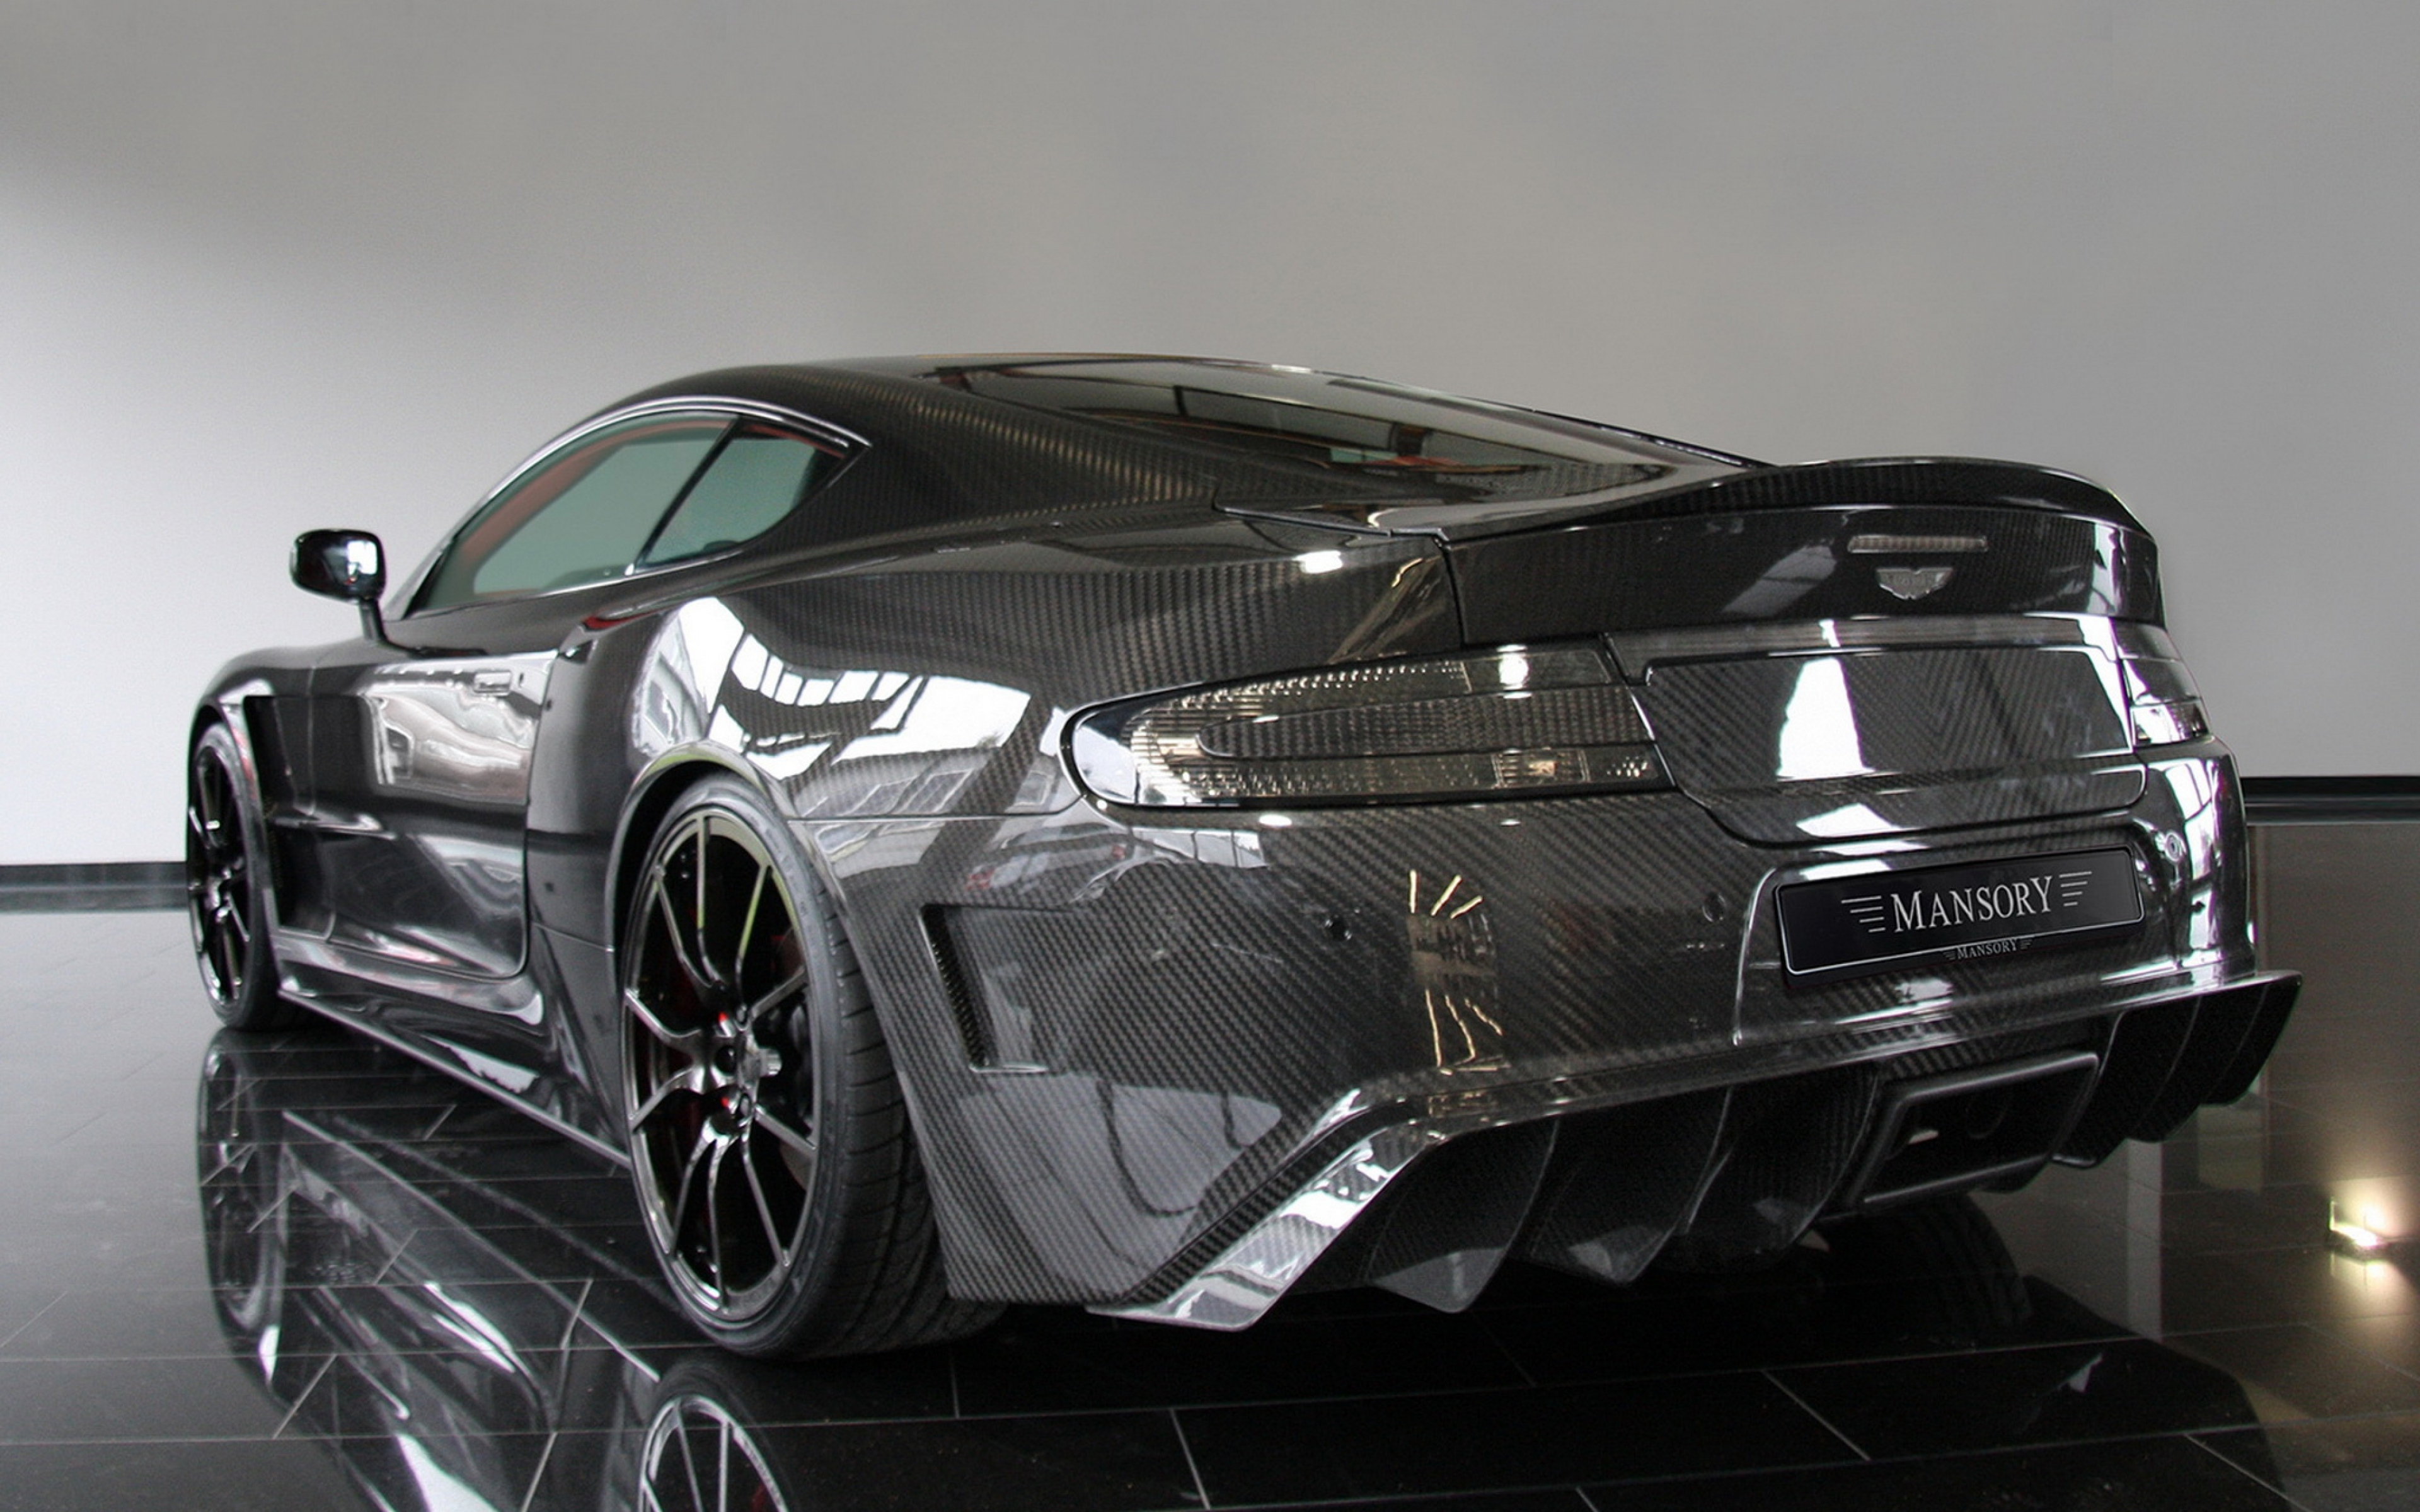 Download Wallpaper 3840x2400 Mansory Aston martin Dbs 2009 Carbon 3840x2400